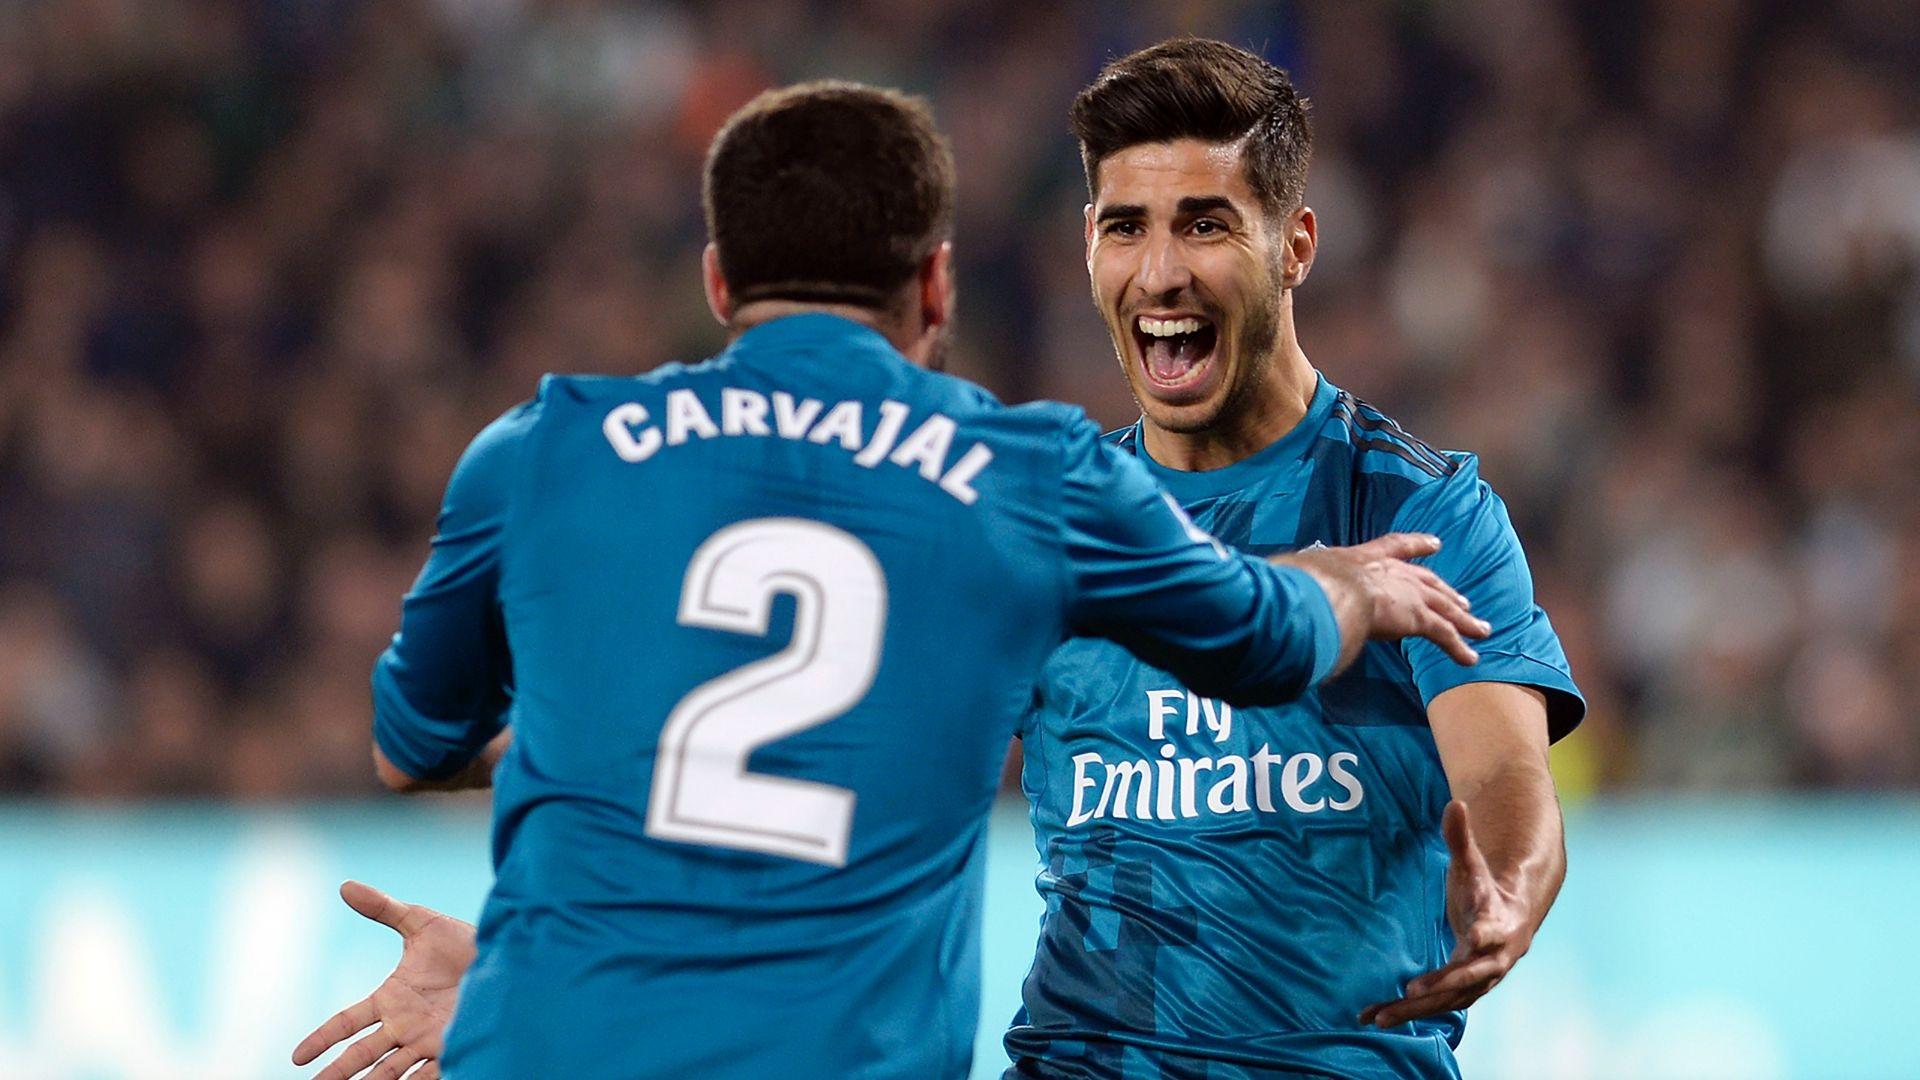 Реал — Барселона. Прогноз на матч 27 февраля 2019. Кубок Испании